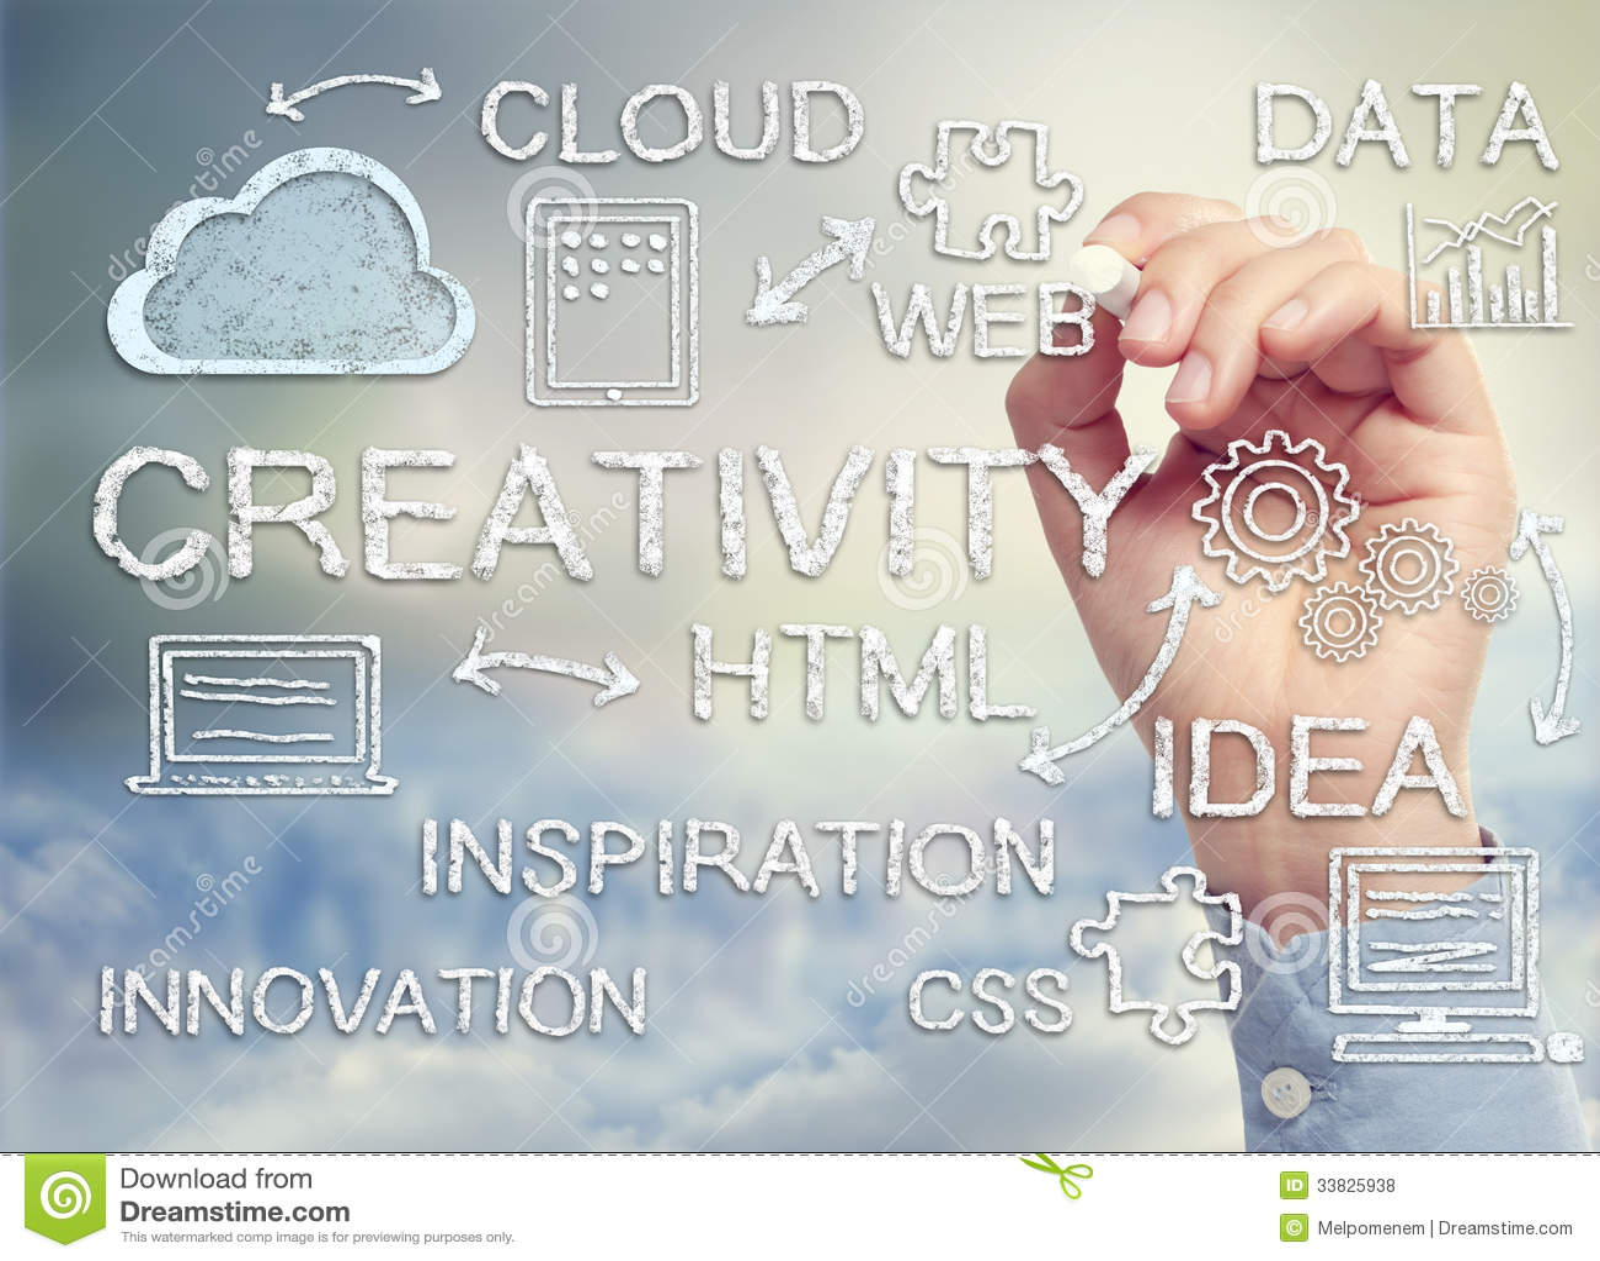 Online creative writing